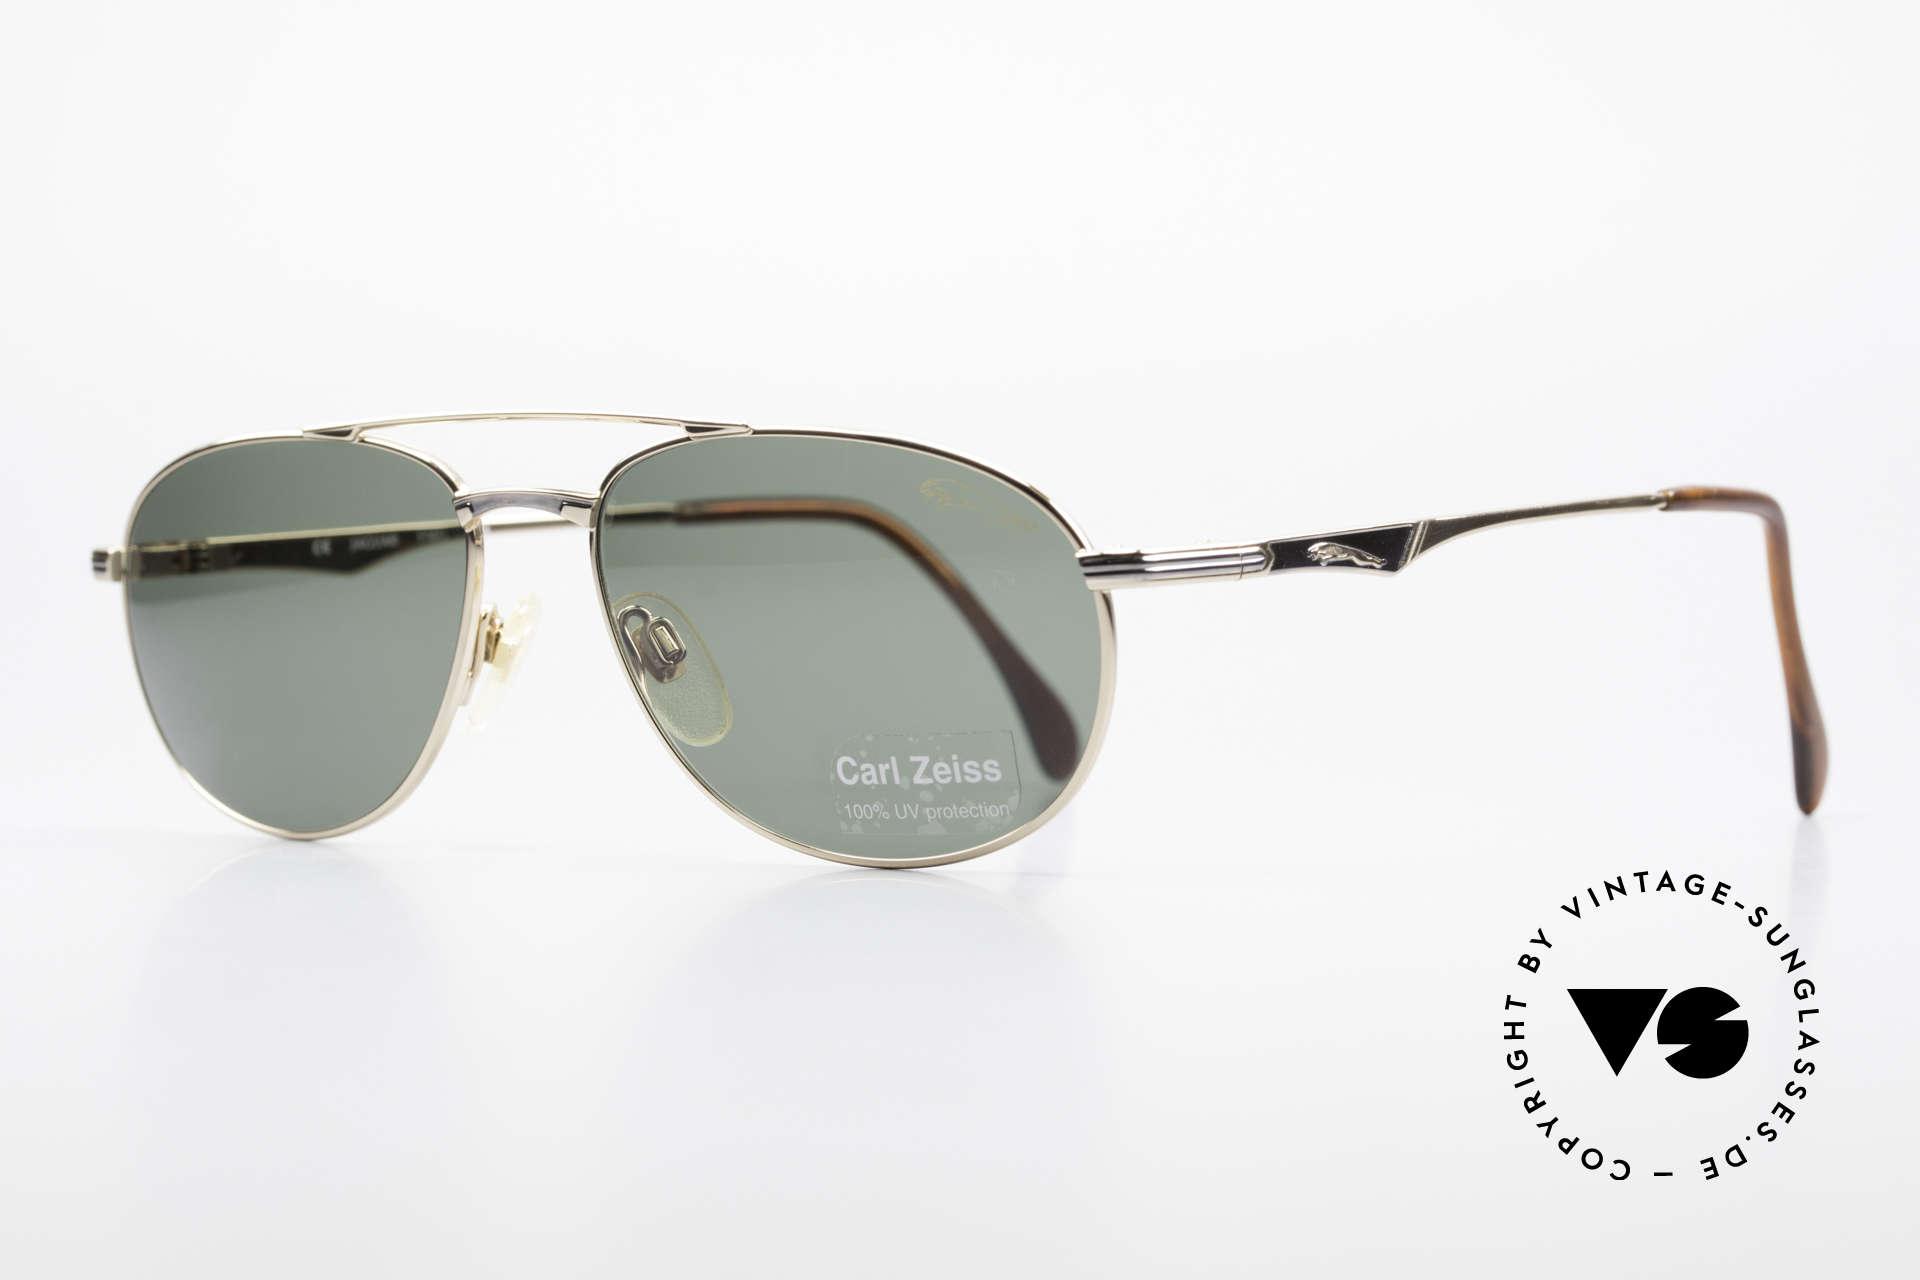 Jaguar 3709 Rare Vintage Sunglasses 90's, elegant frame design & timeless classic gold finish, Made for Men